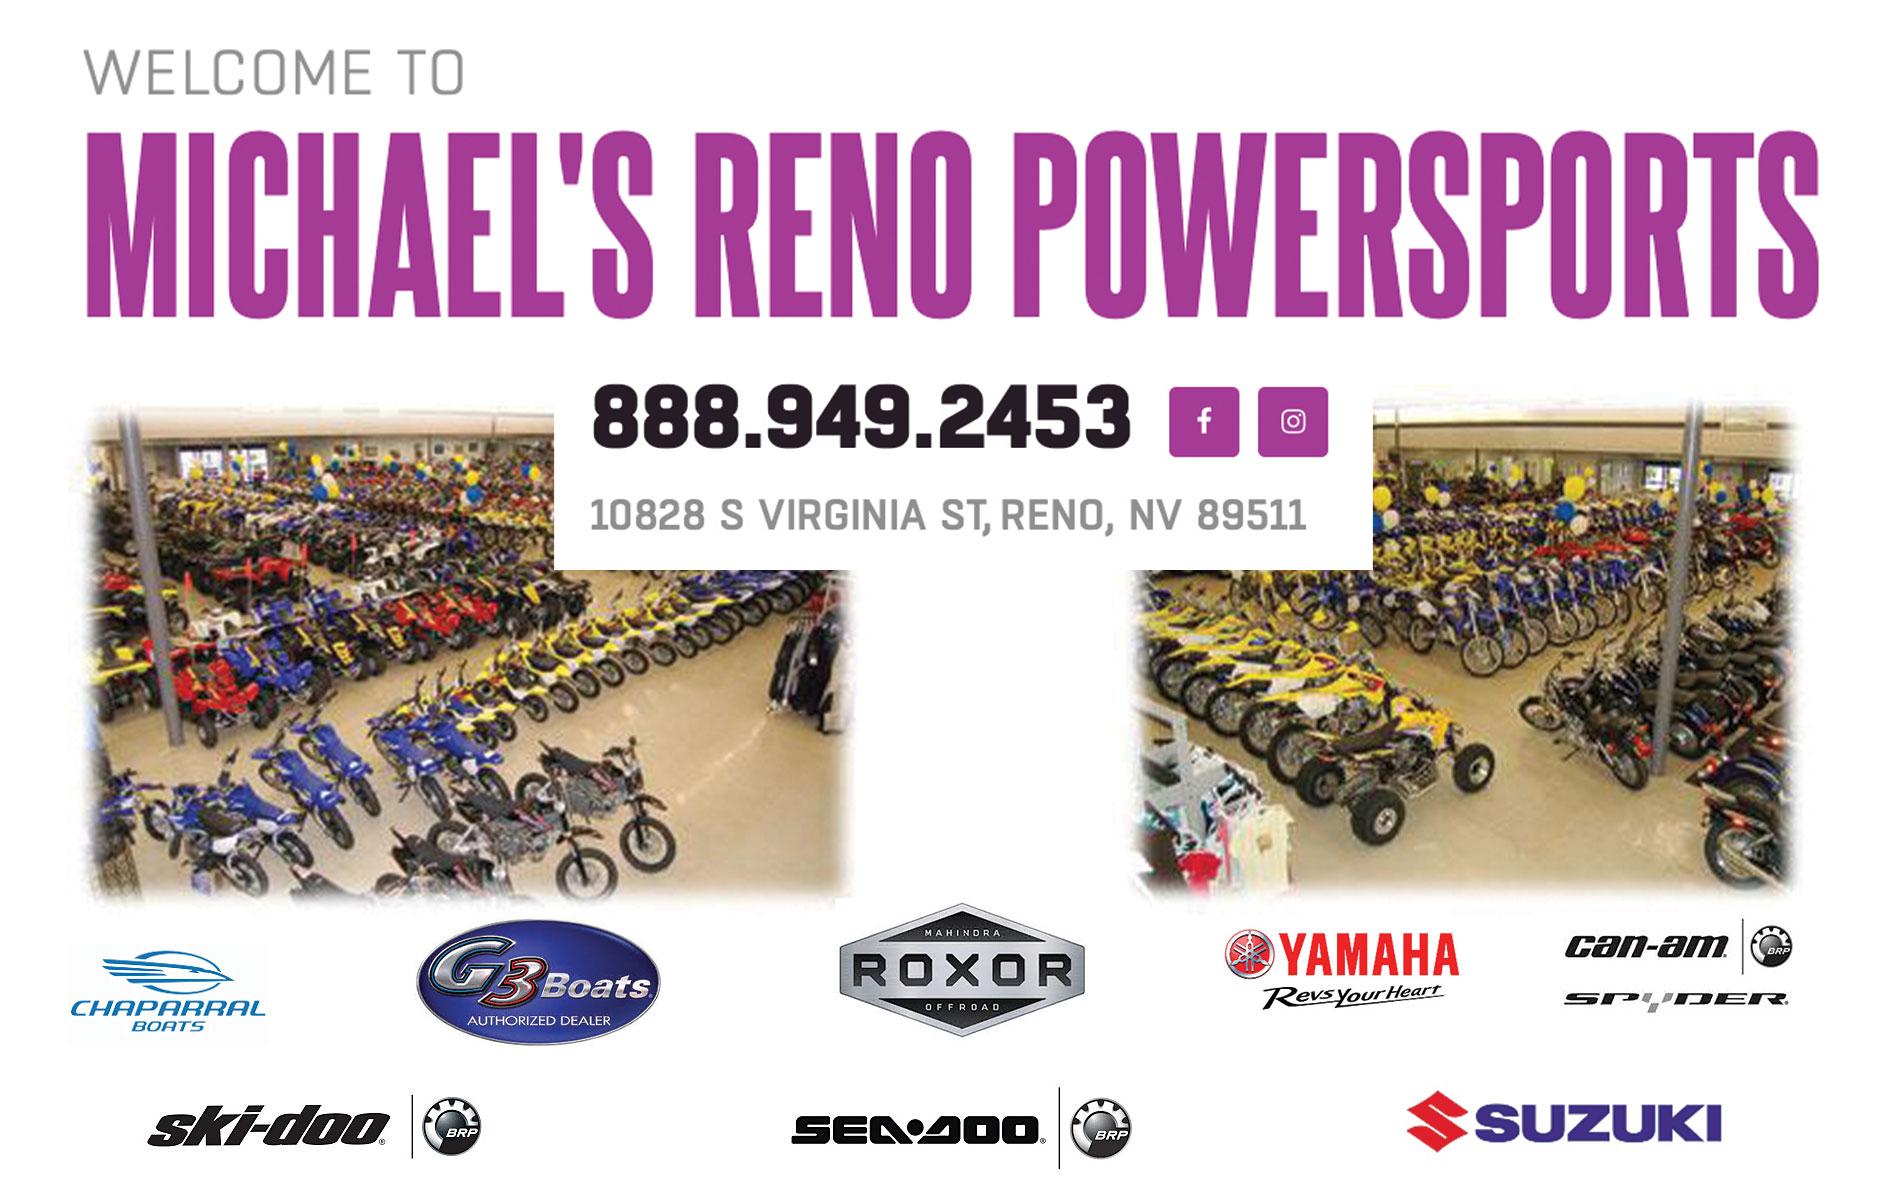 Michaels Reno Powersports